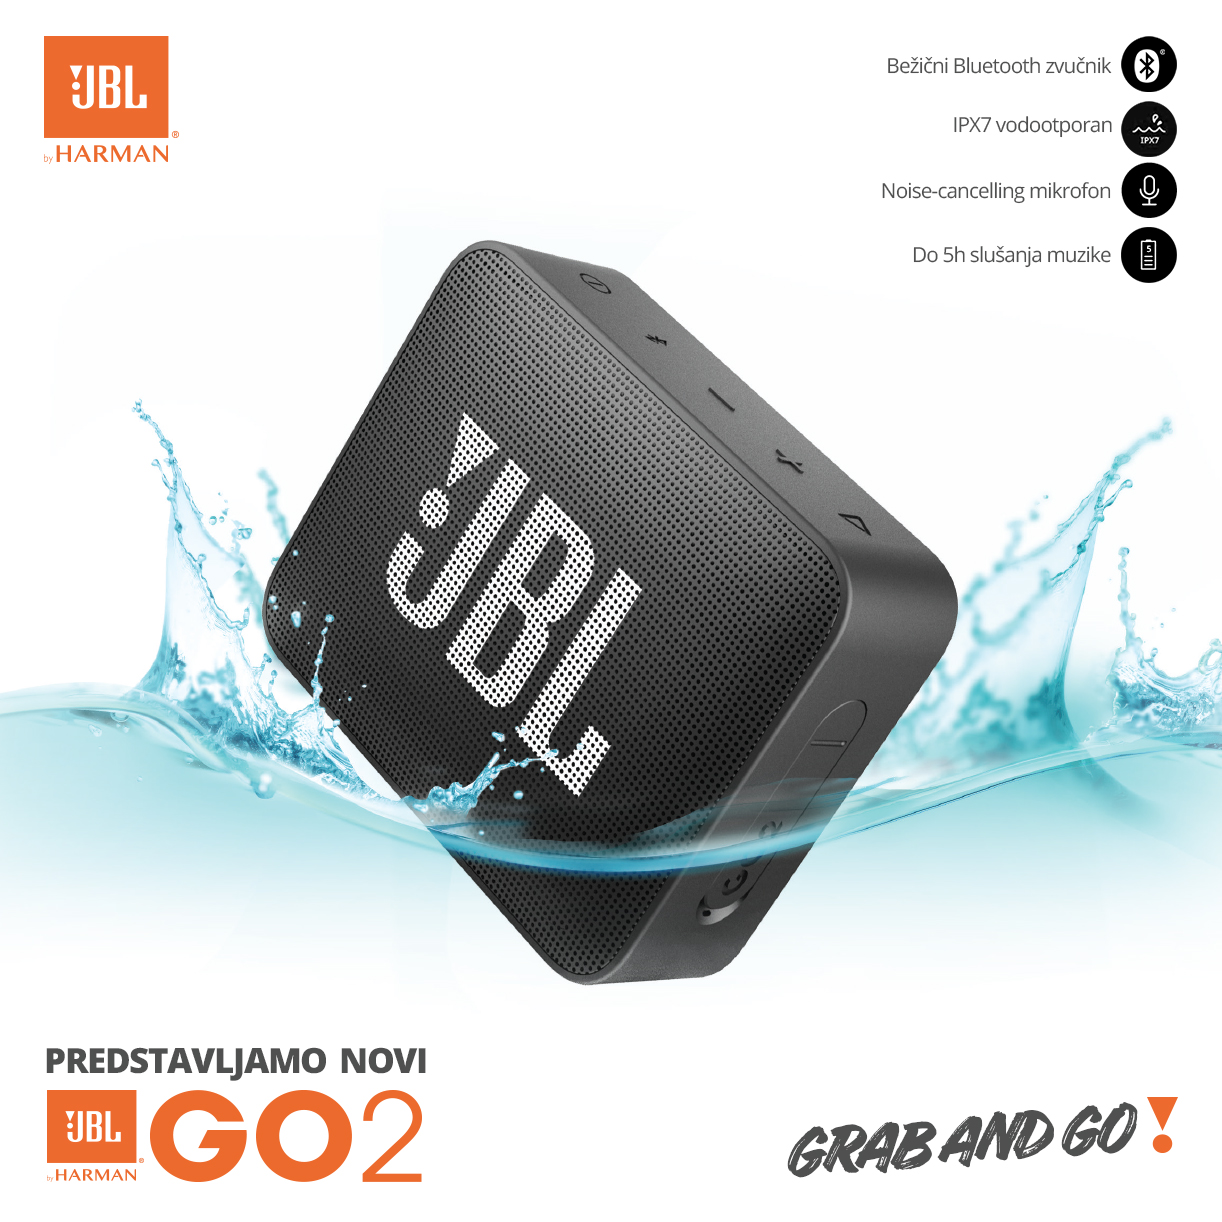 RS - JBL GO 2